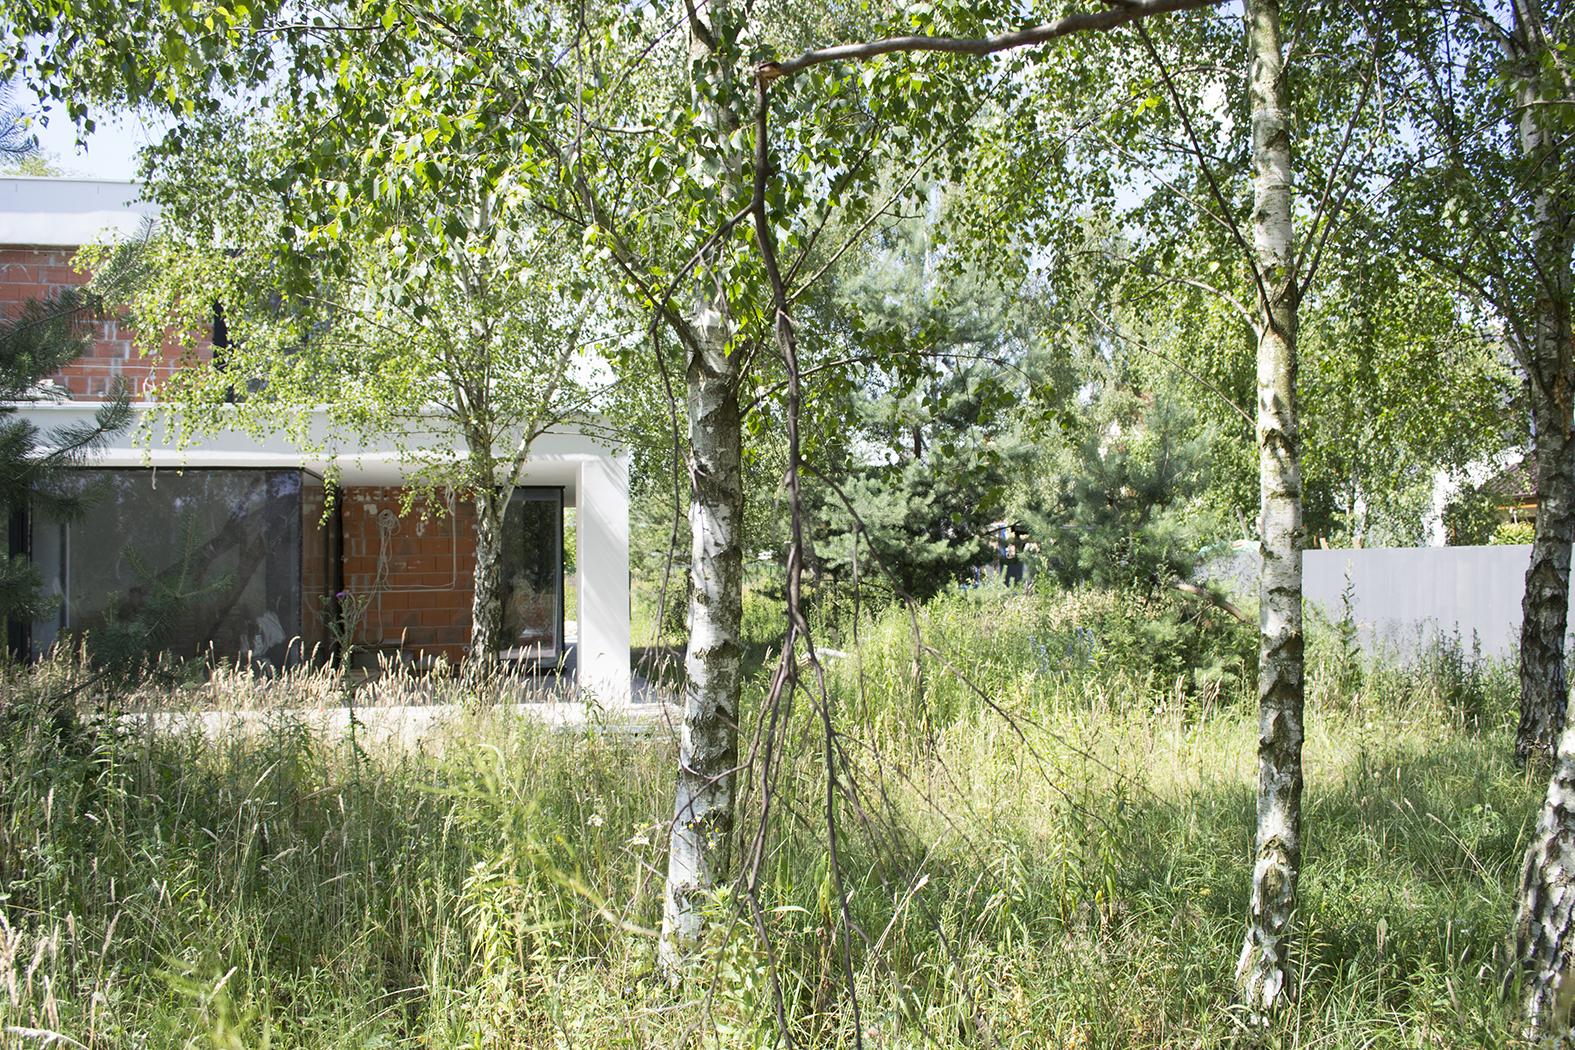 moderna-zahrada-projekt-navhr-rock-and-flower-studio-praha-betonove-zahrady -realizace